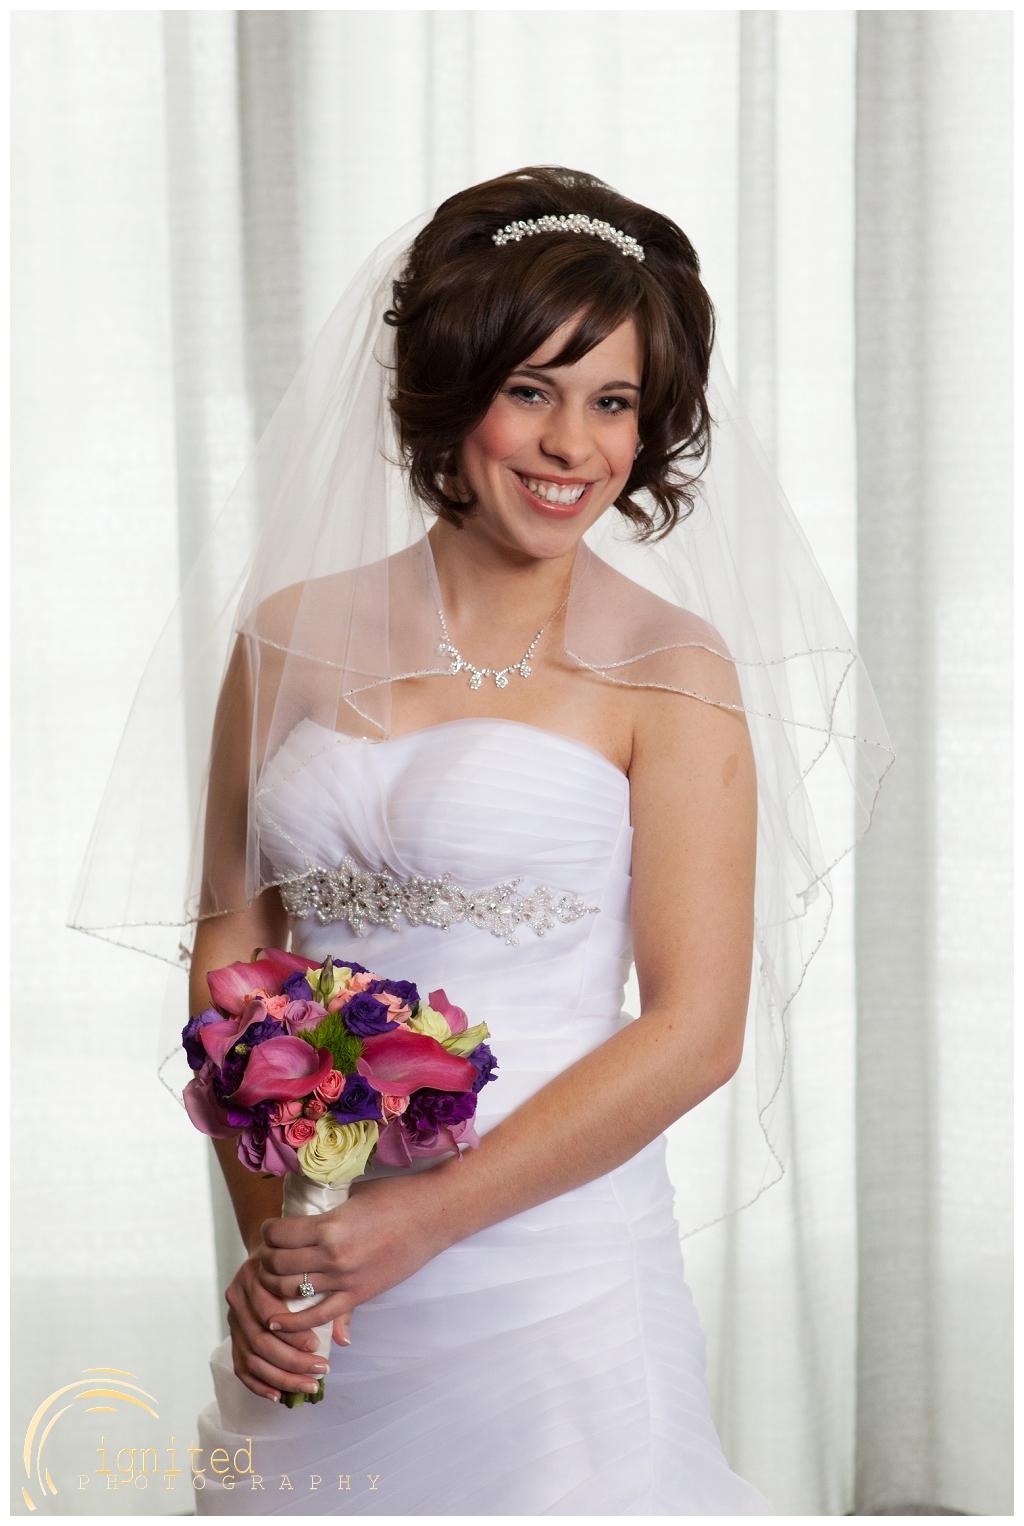 ignited Photography Alyssa  Castwell and Caleb Merna Wedding Brighton Nazarene The Naz Howell MI_0024.jpg